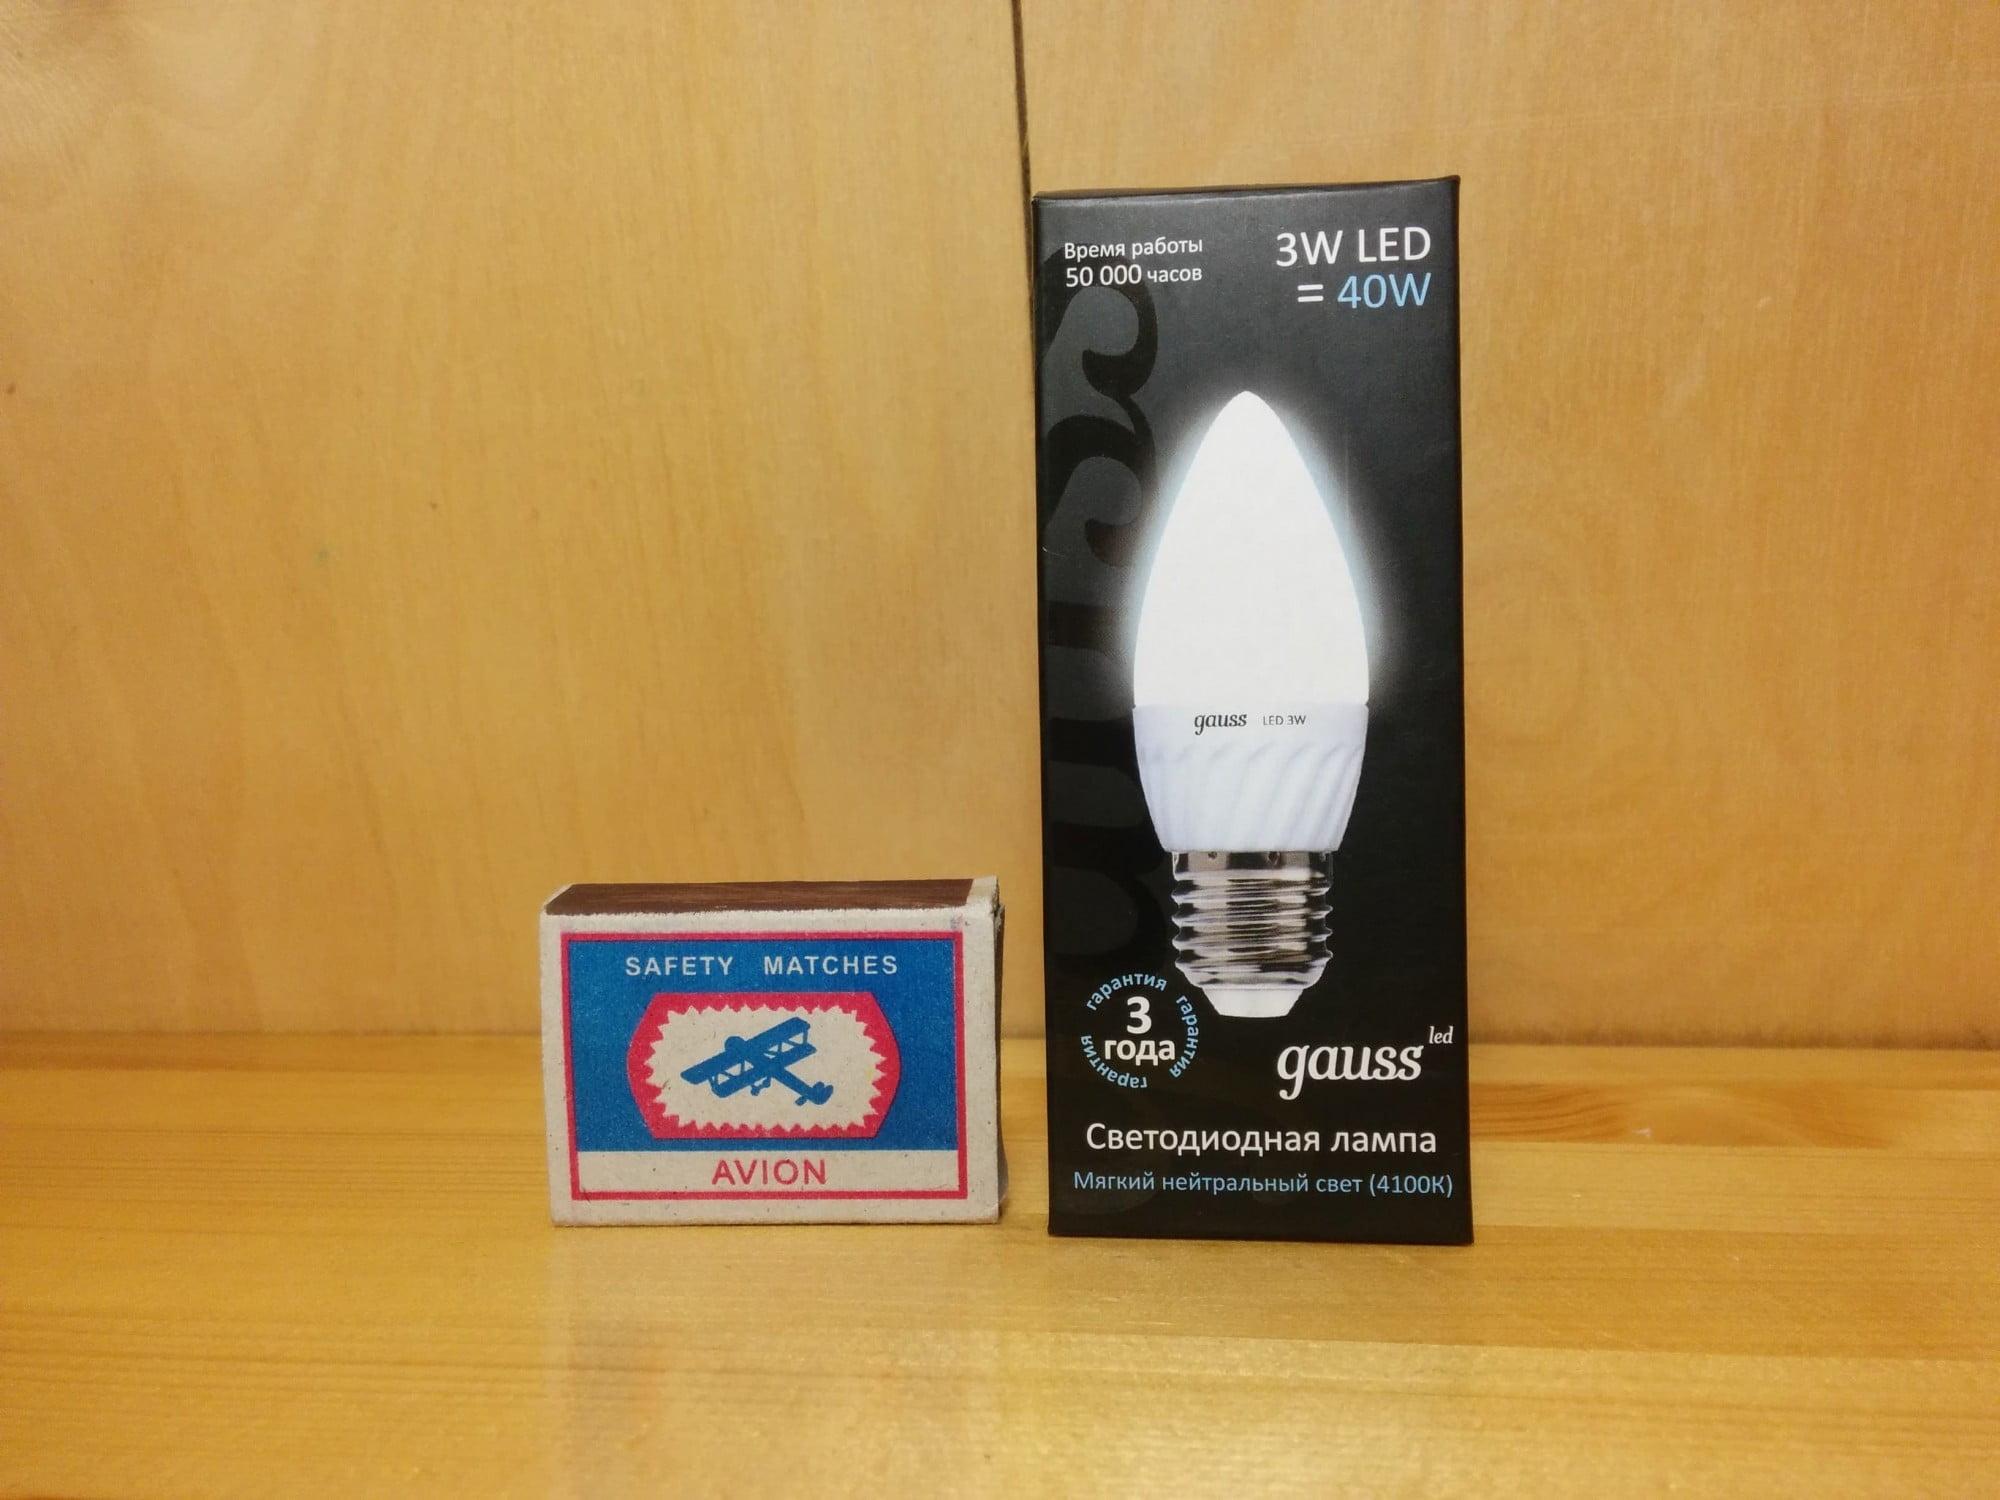 Gauss LED Ceramic Candle 3W E27 4100K упаковка